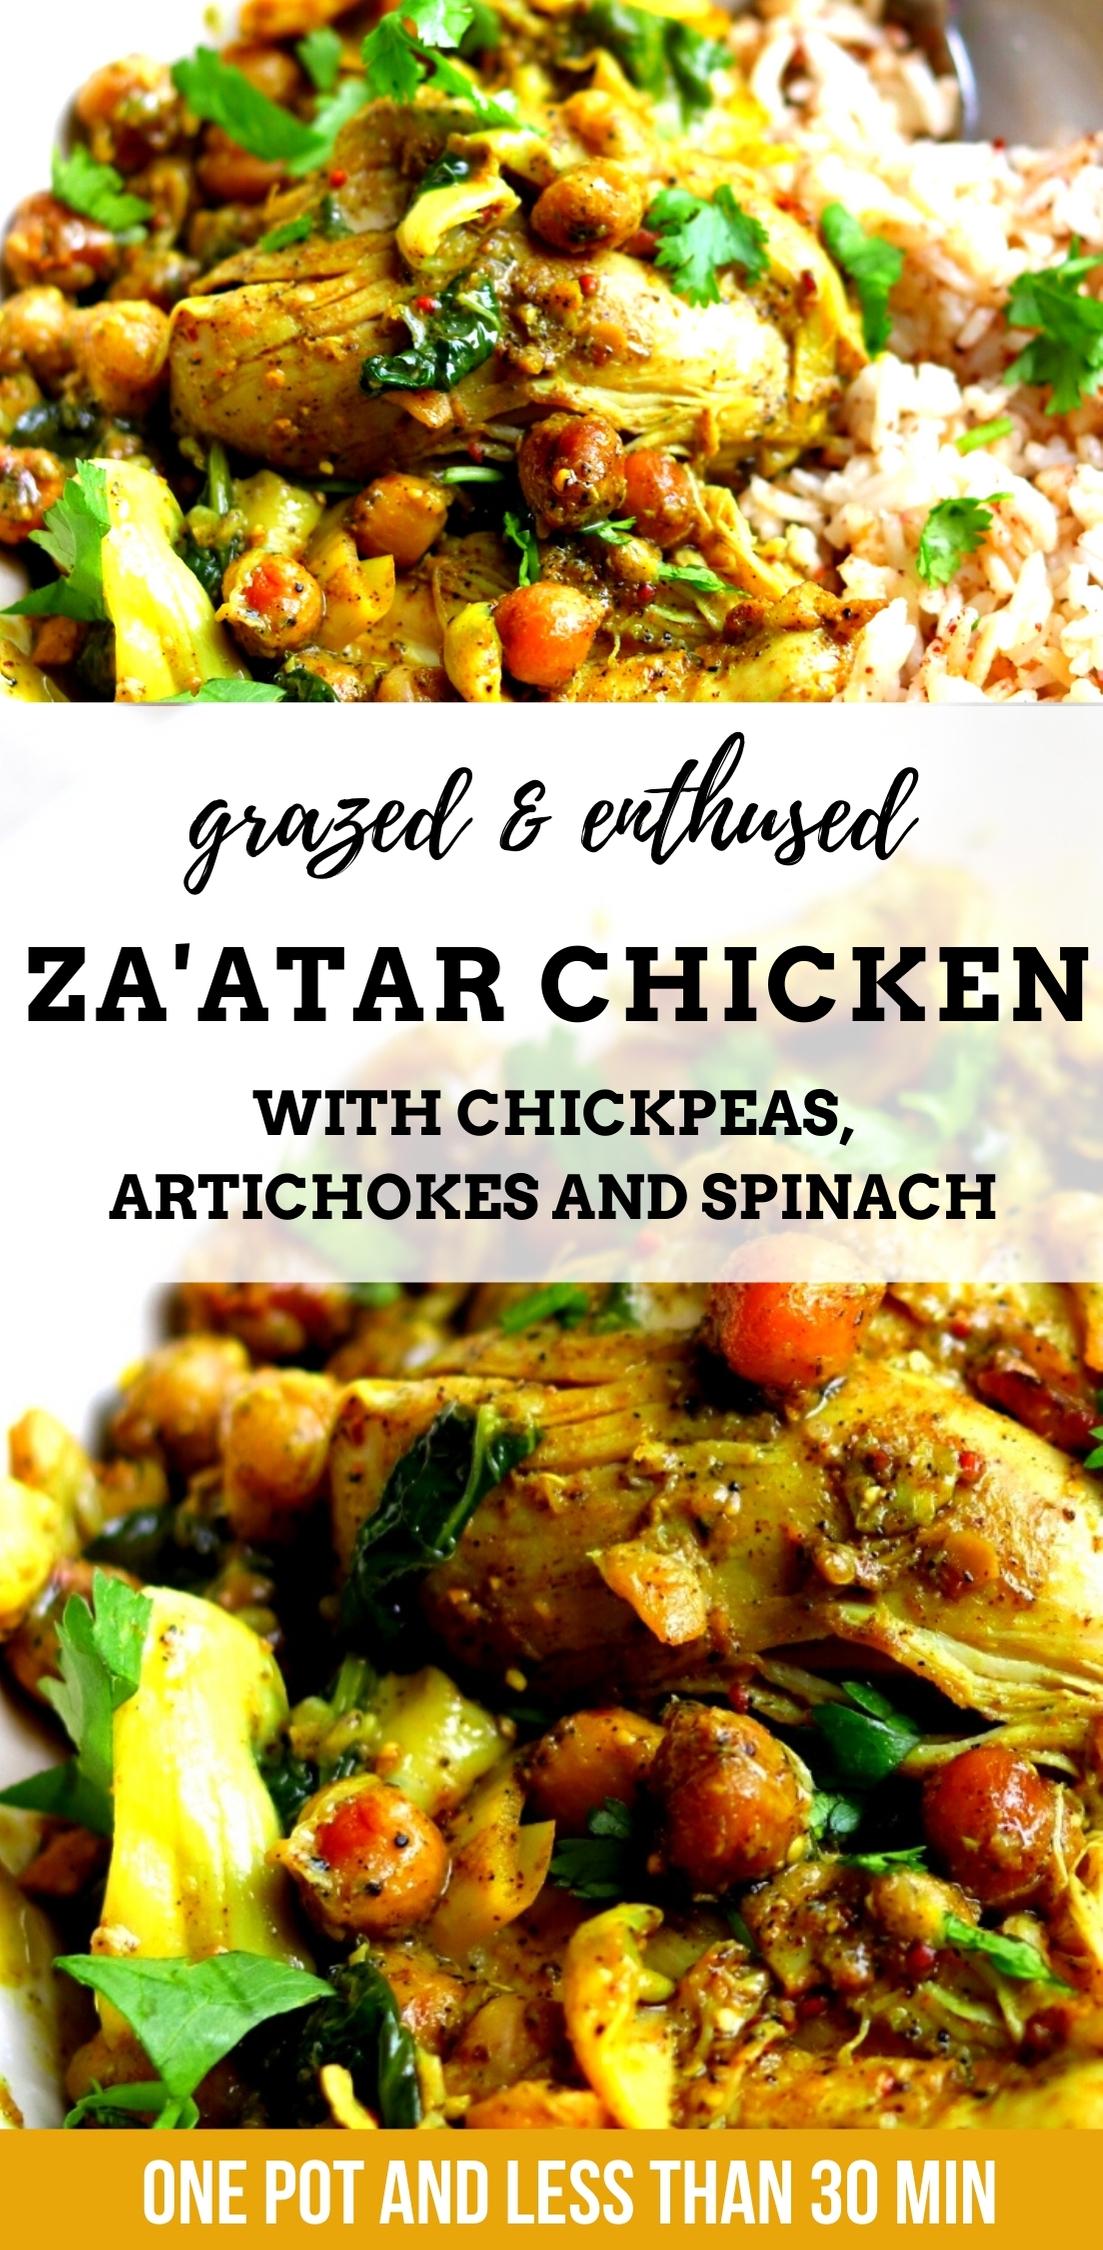 Lebanese Za'atar Chicken Chickpeas Artichokes